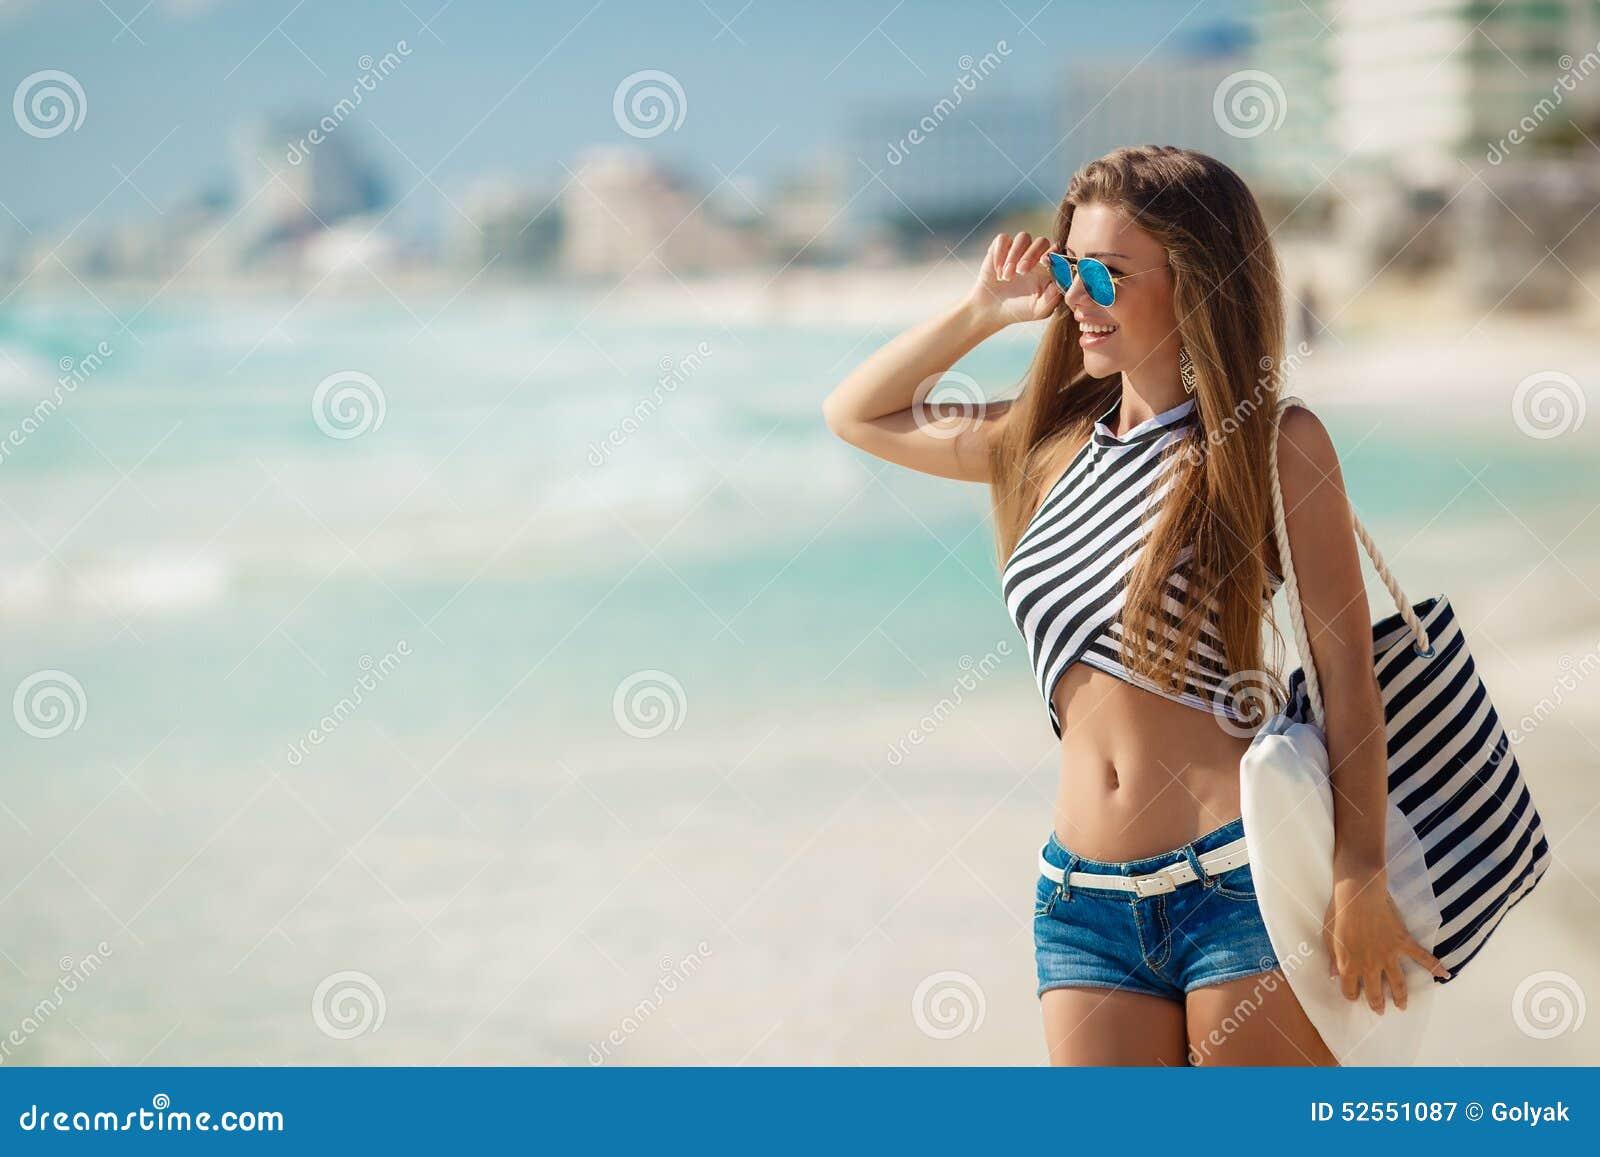 Portrait Of Girl With Beach Bag On The Beach Stock Photo